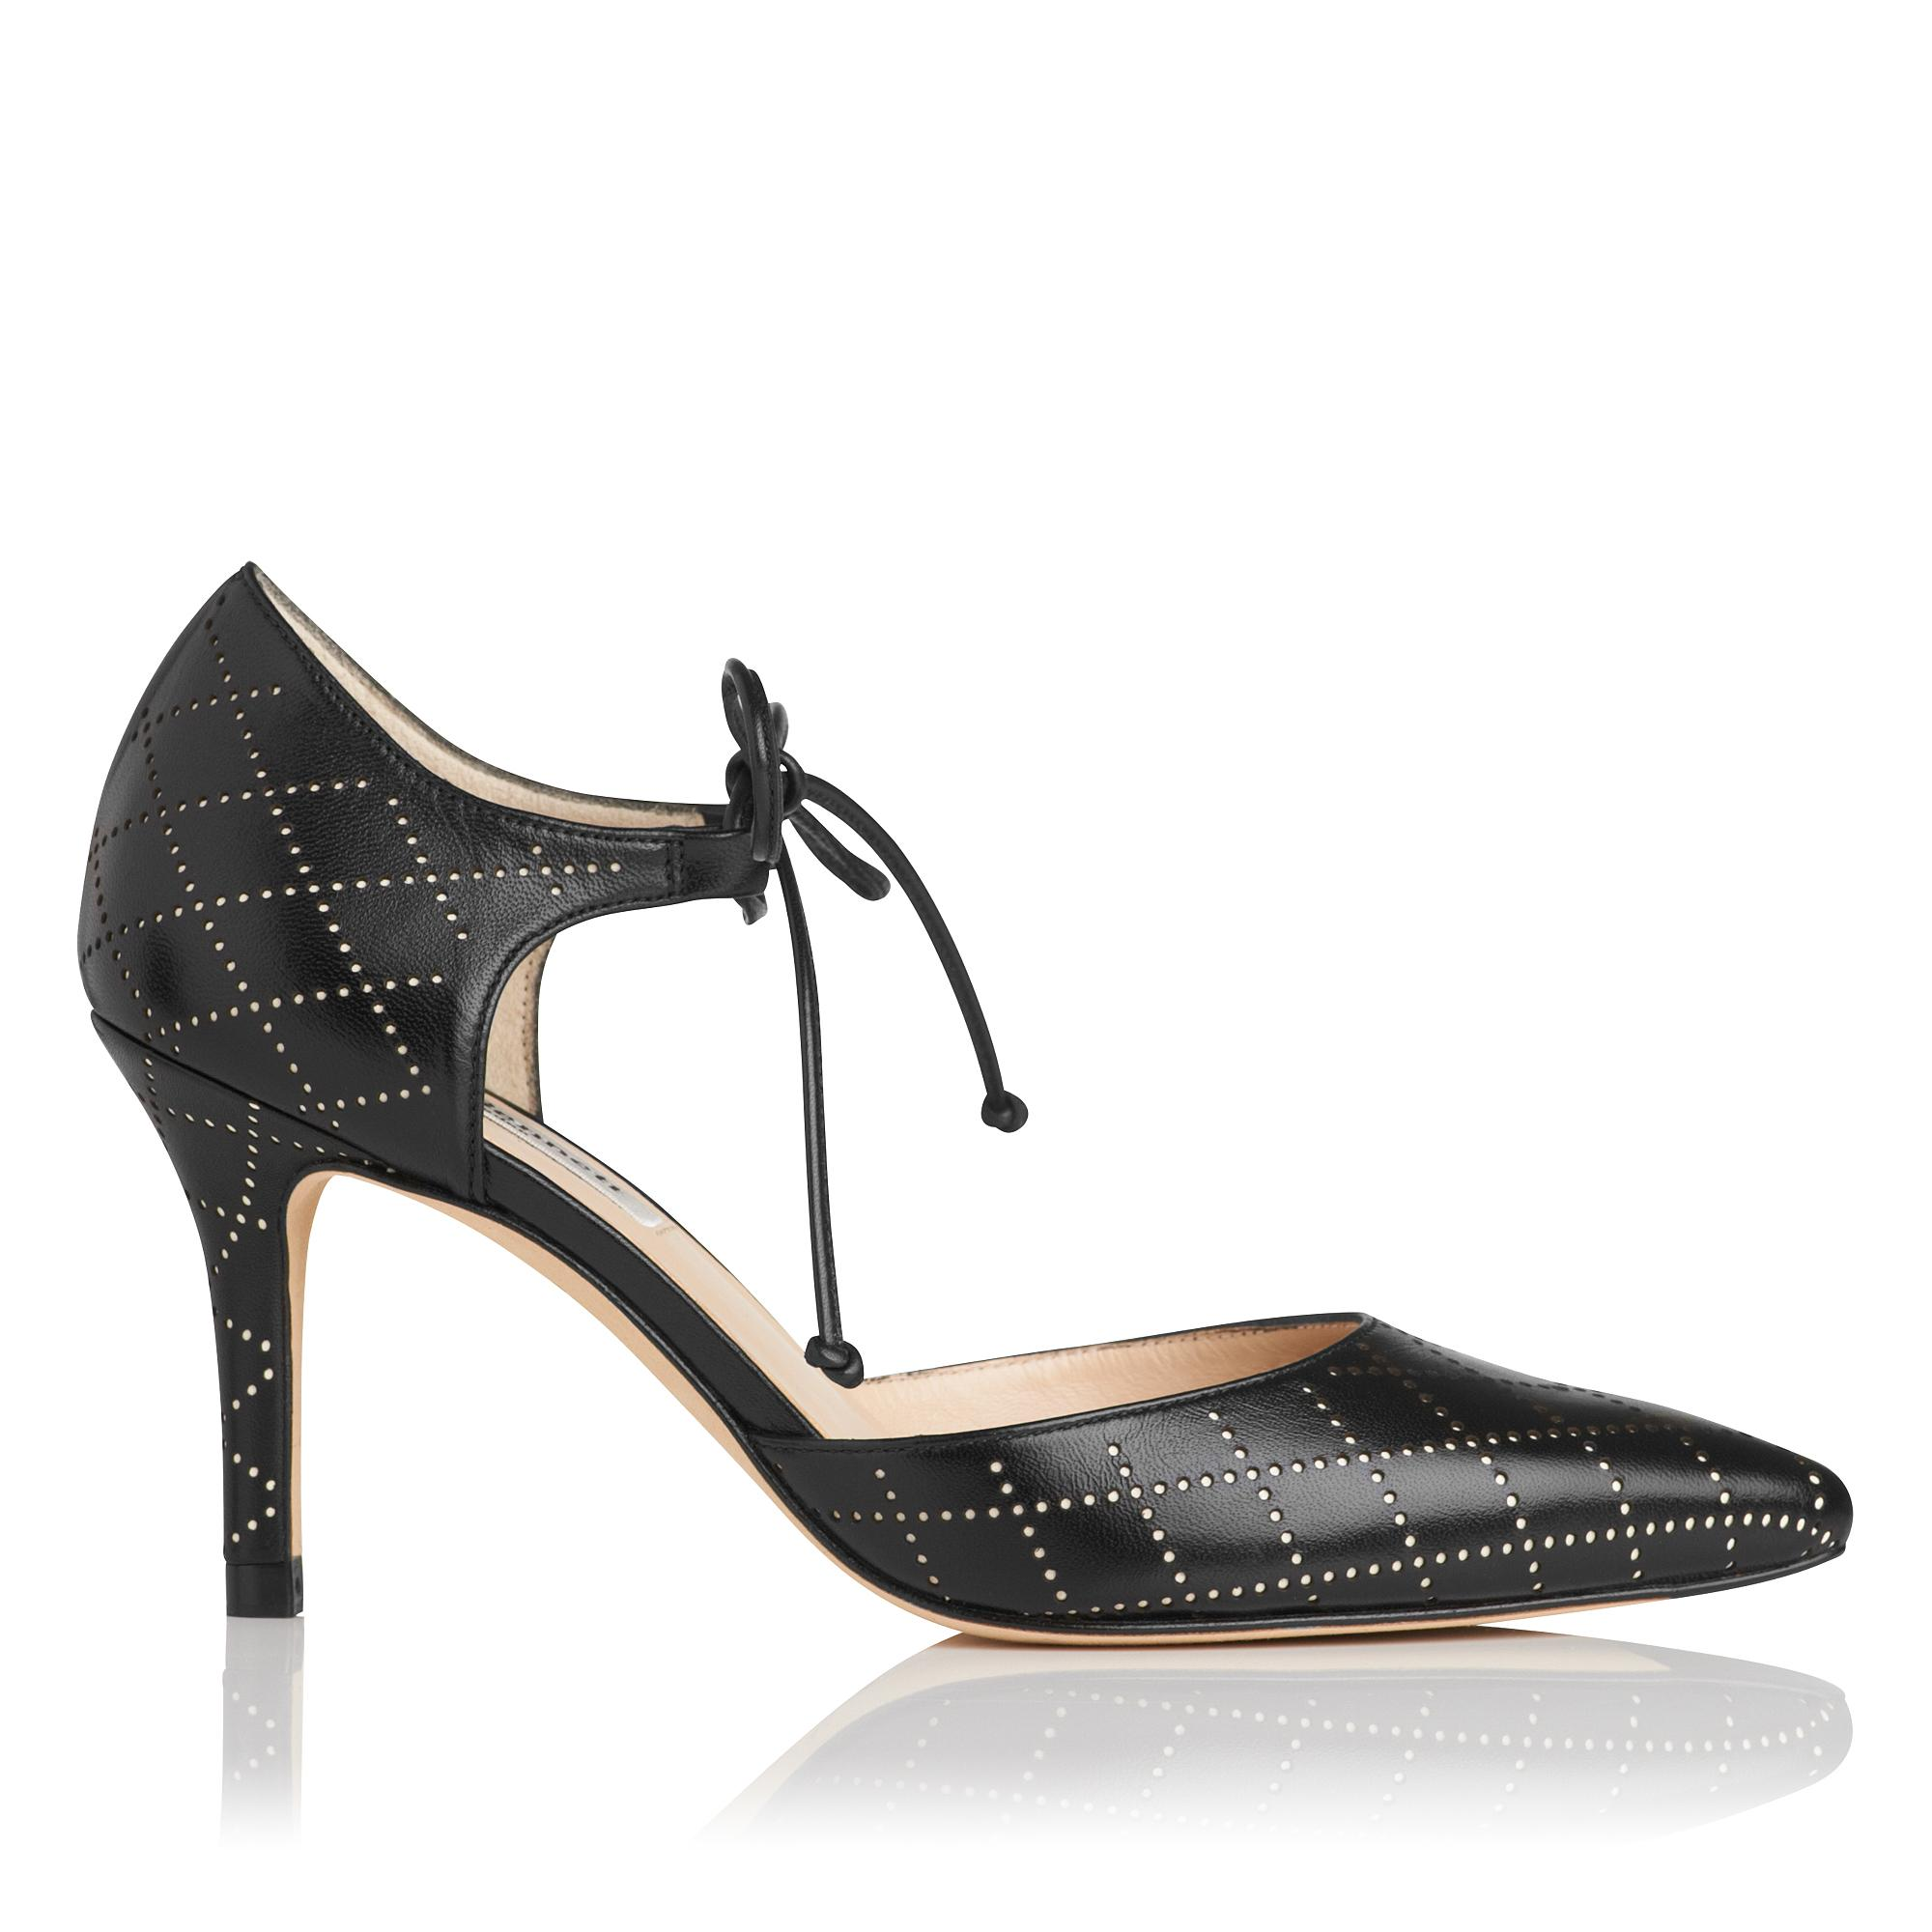 Fauna Black Leather Heel